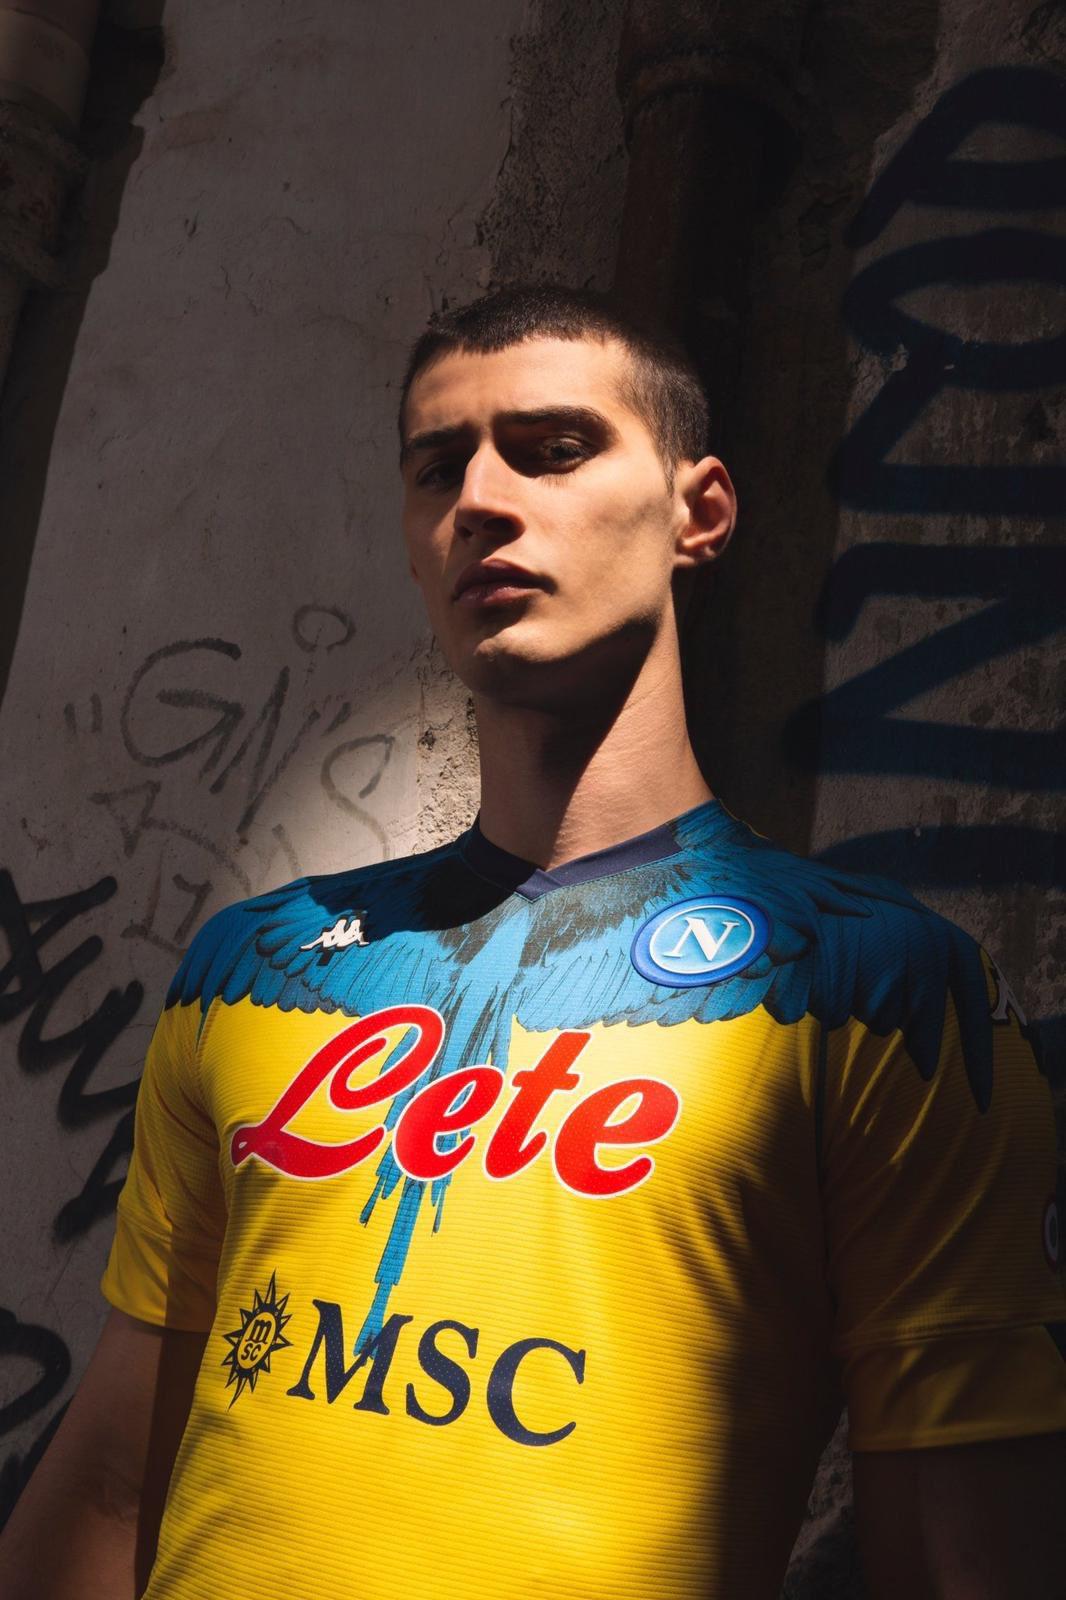 Camisas do Napoli 2021 Kappa x Marcelo Burlon GK